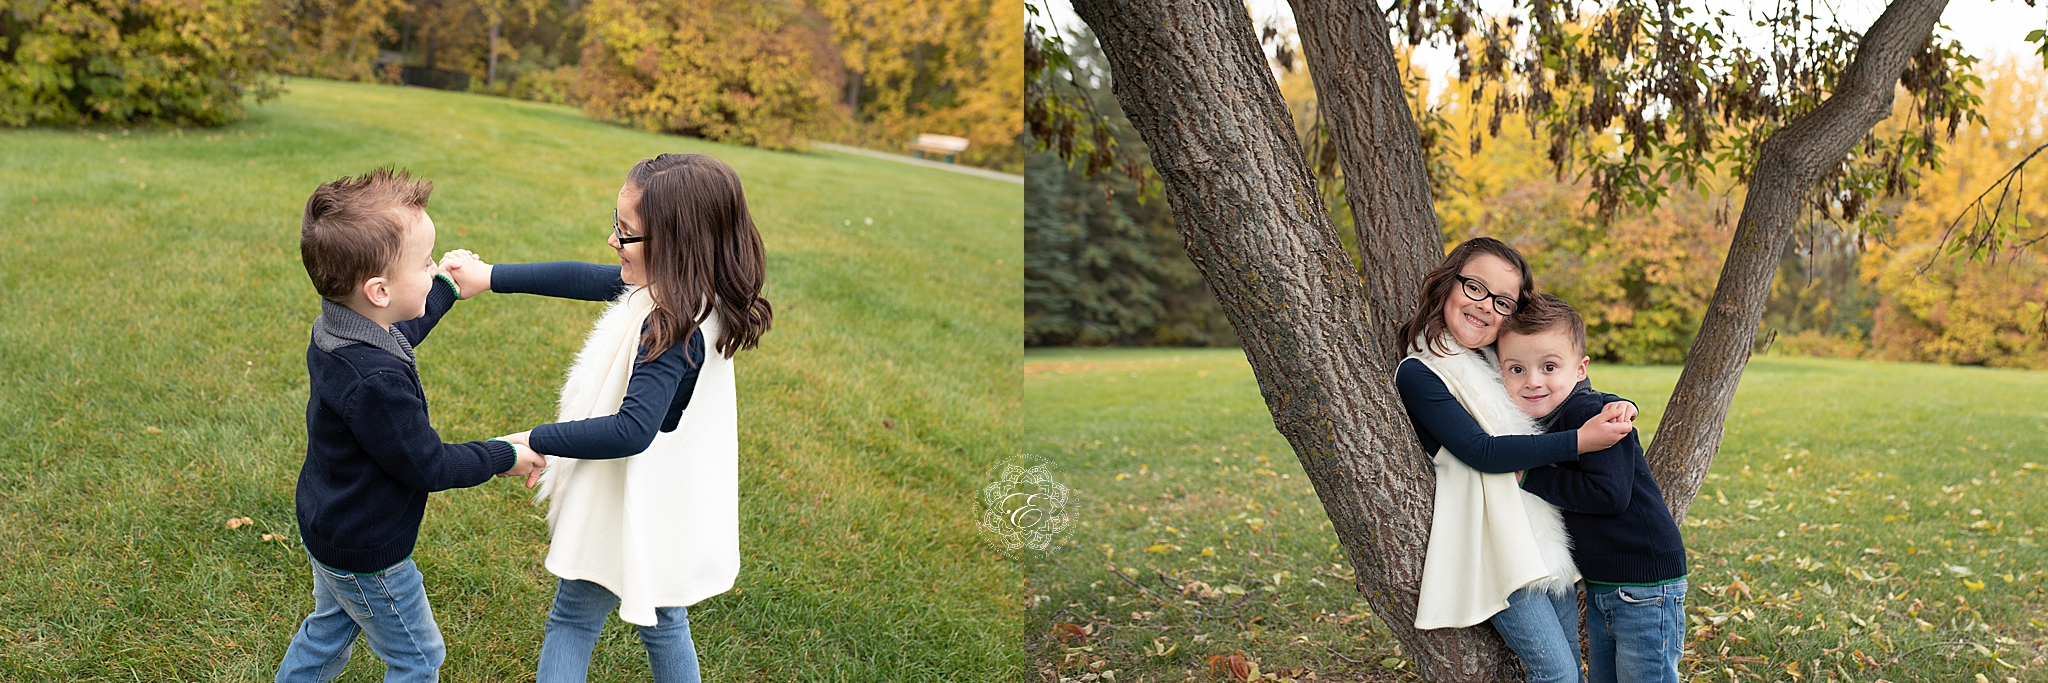 edmonton-back-to-school-photos.jpg